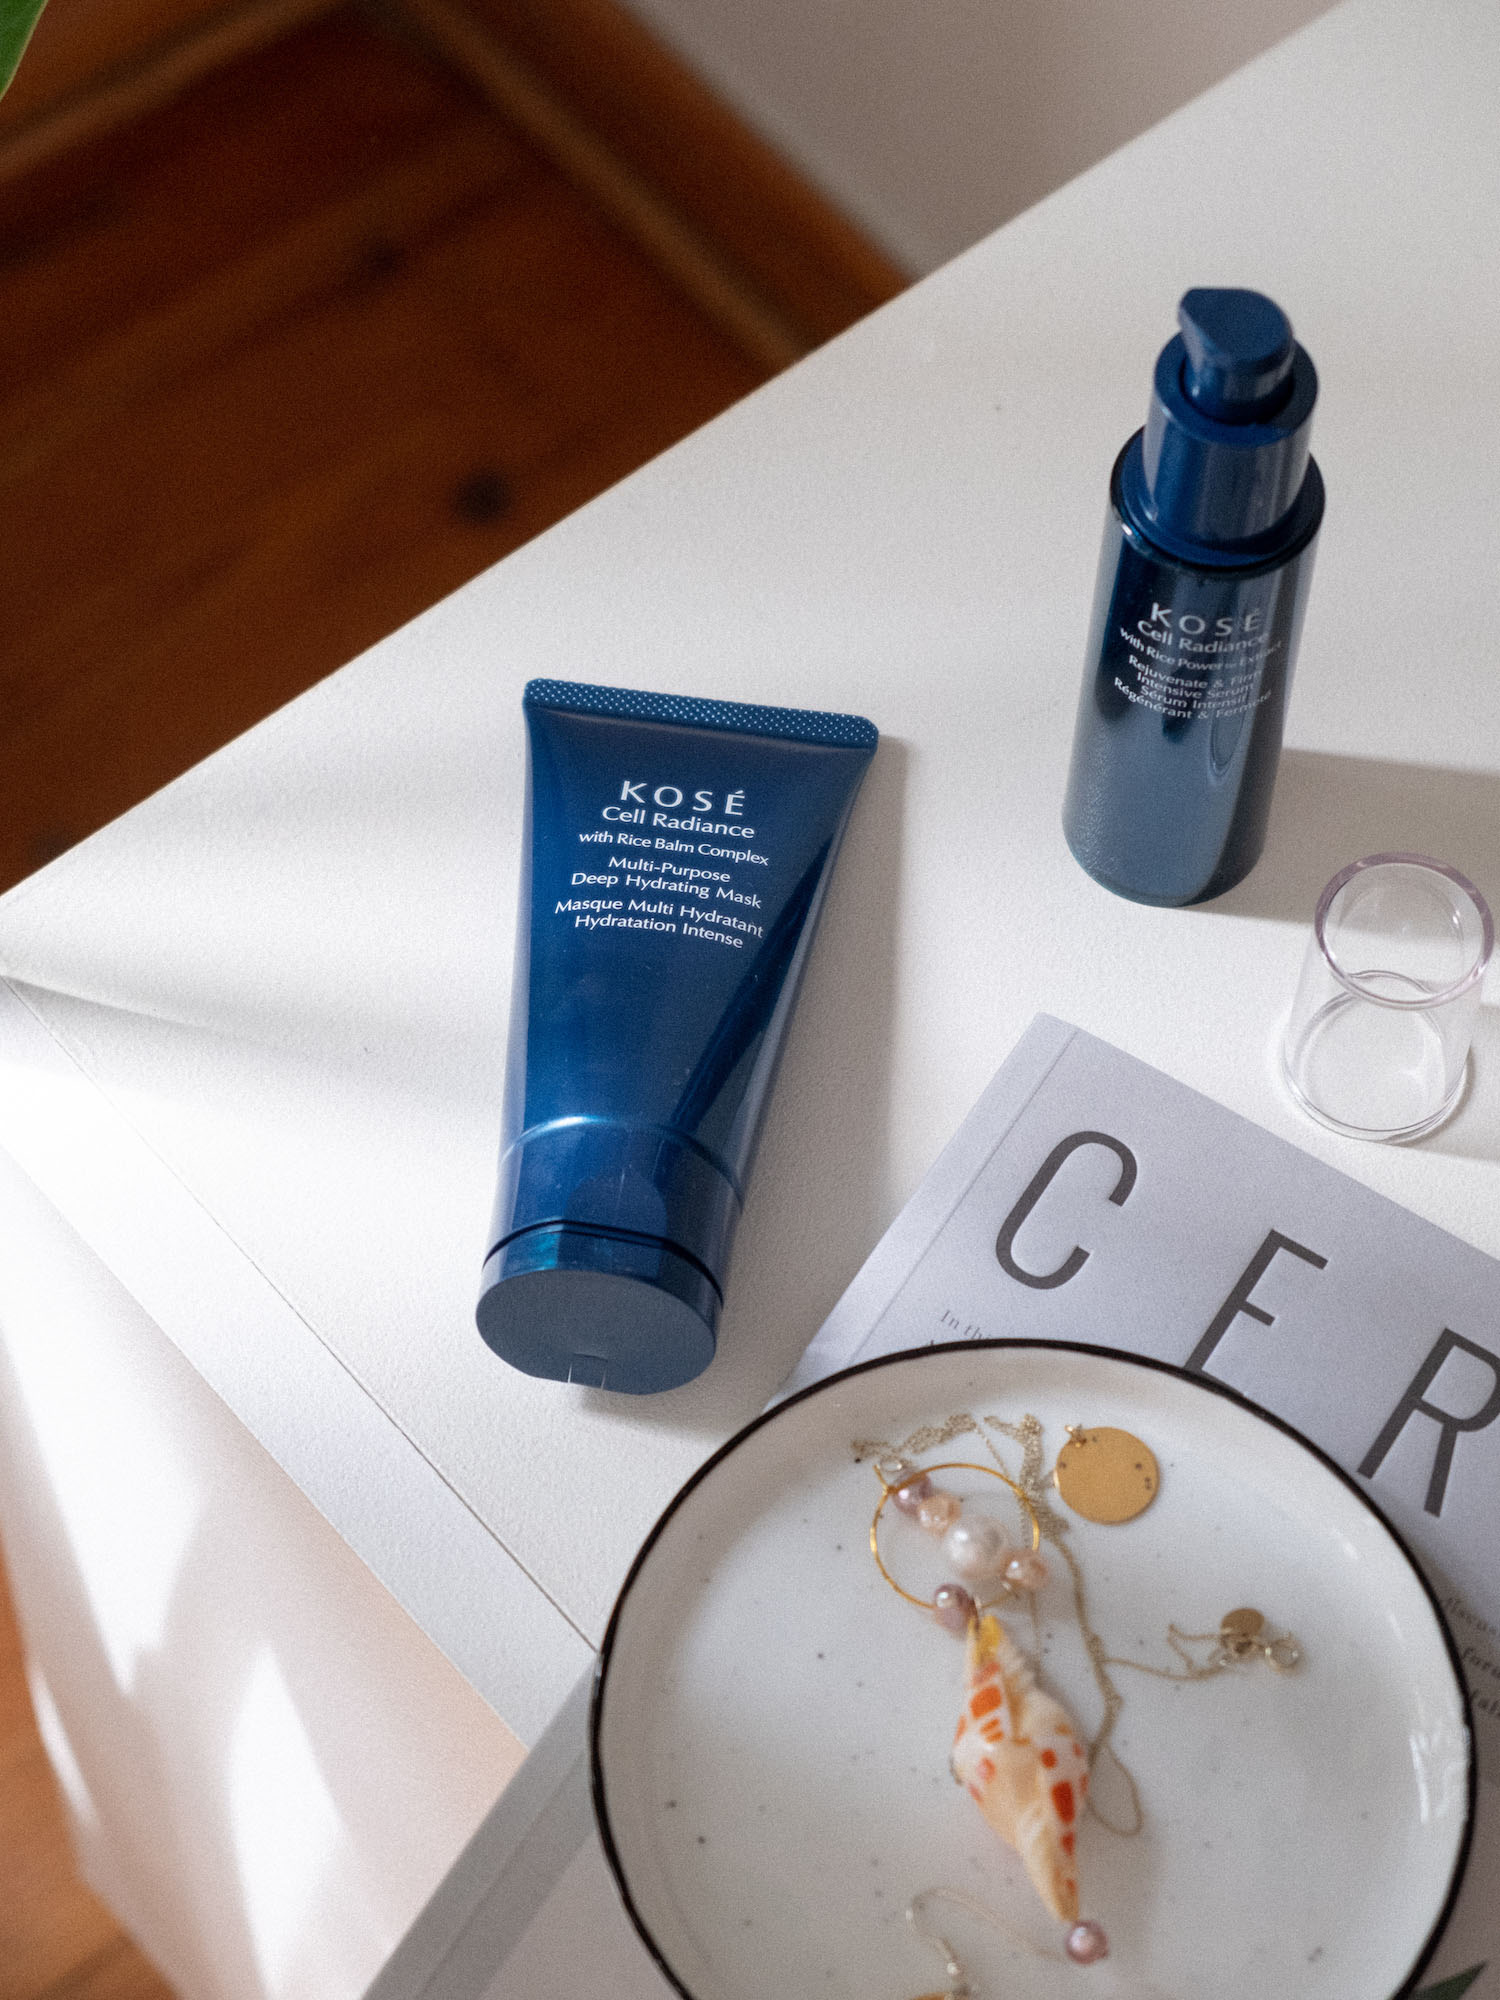 Beautyblog_ Schönheitsgeheimnisse aus Japan Kose Cell Radiance Multi Purpose Deep Hydration Mask